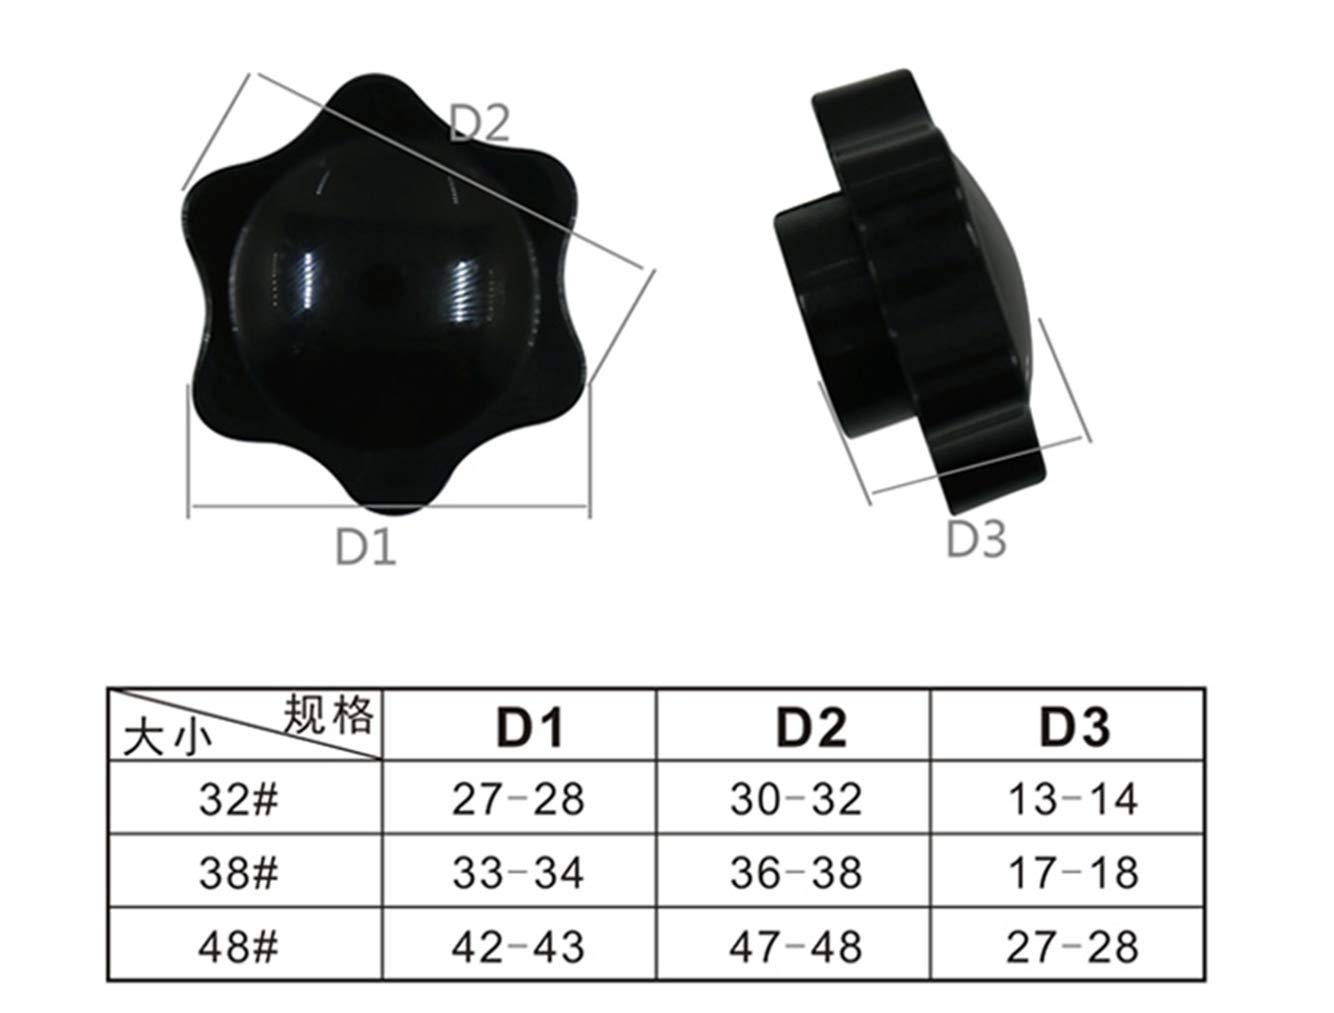 Luchang M4 M5 M6 M8 M10 M12 M4 25 type2 10pcs color negro Tuercas de baquelita para apretar las manos